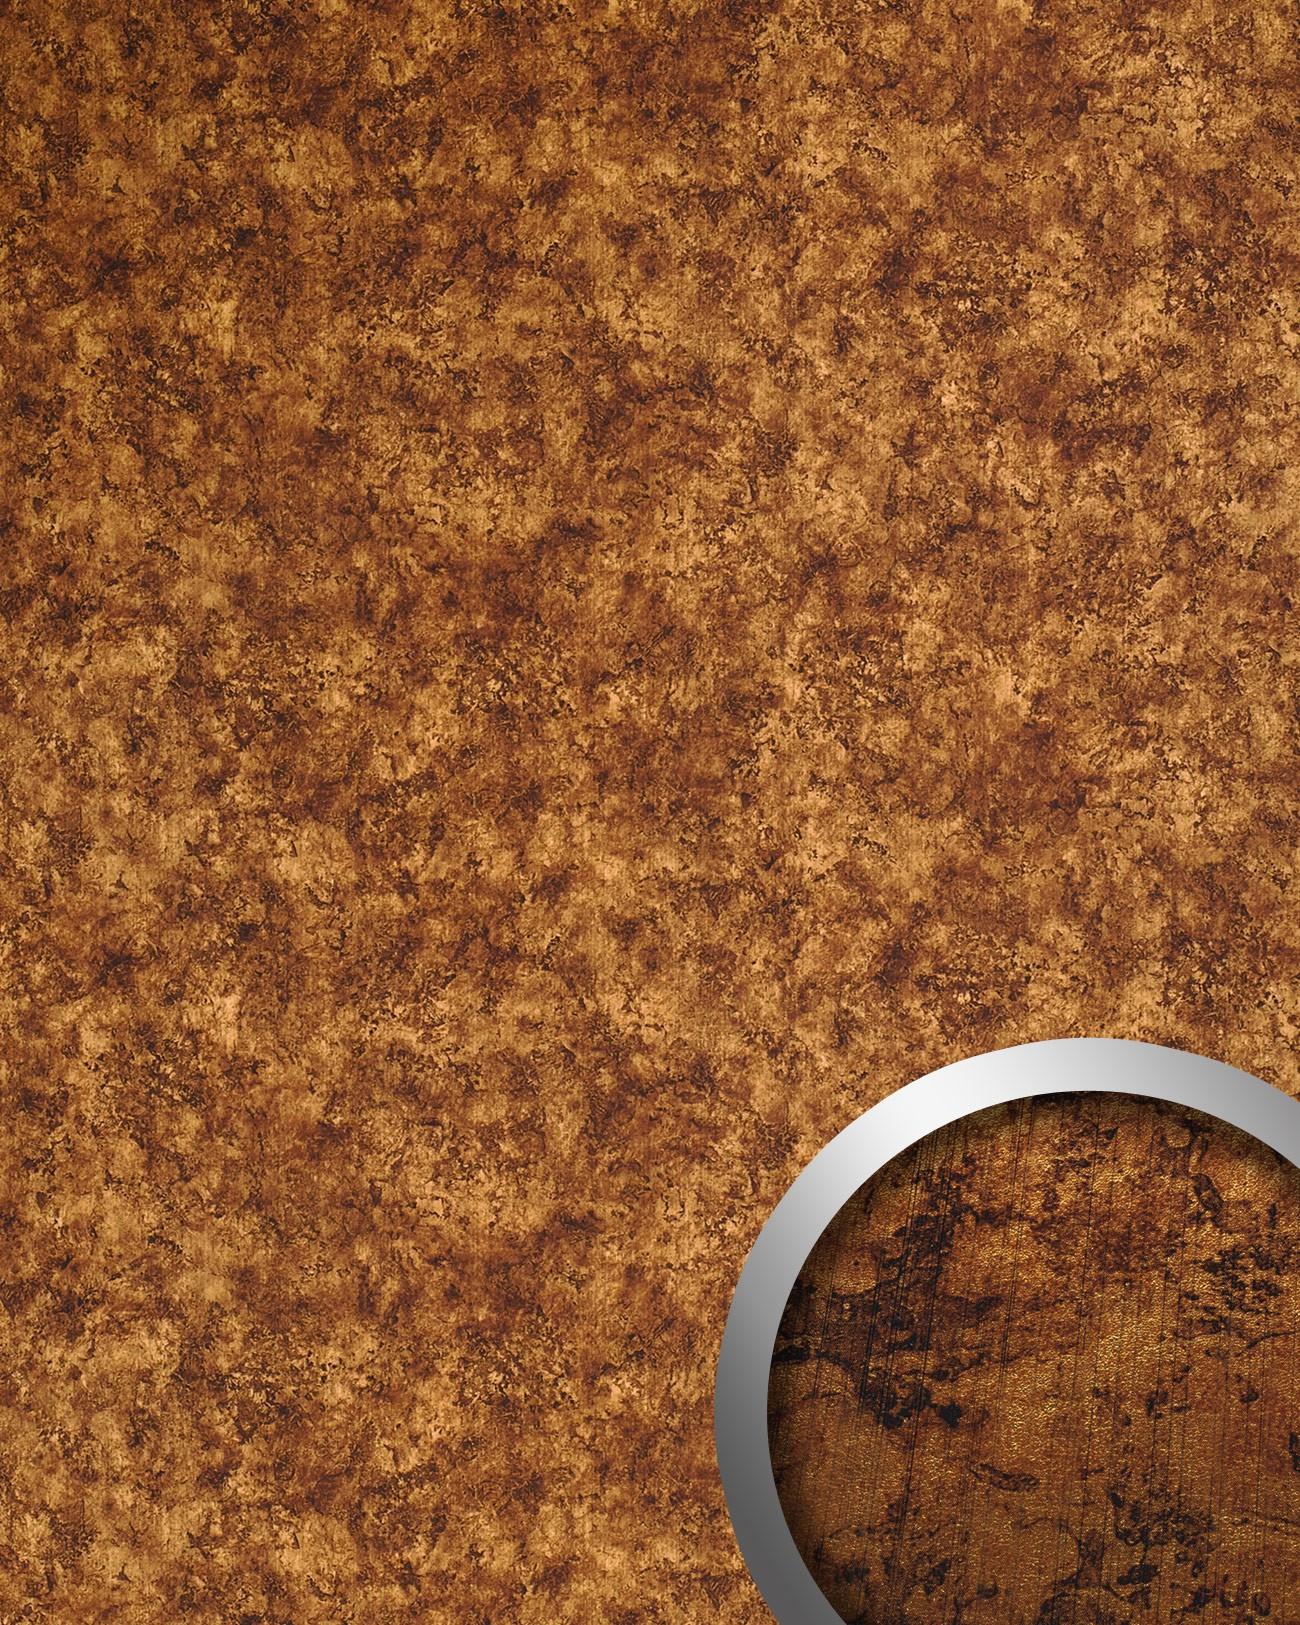 wallface 17277 deco vintage wandpaneel metall rost optik kupfer braun 2 60 qm ebay. Black Bedroom Furniture Sets. Home Design Ideas